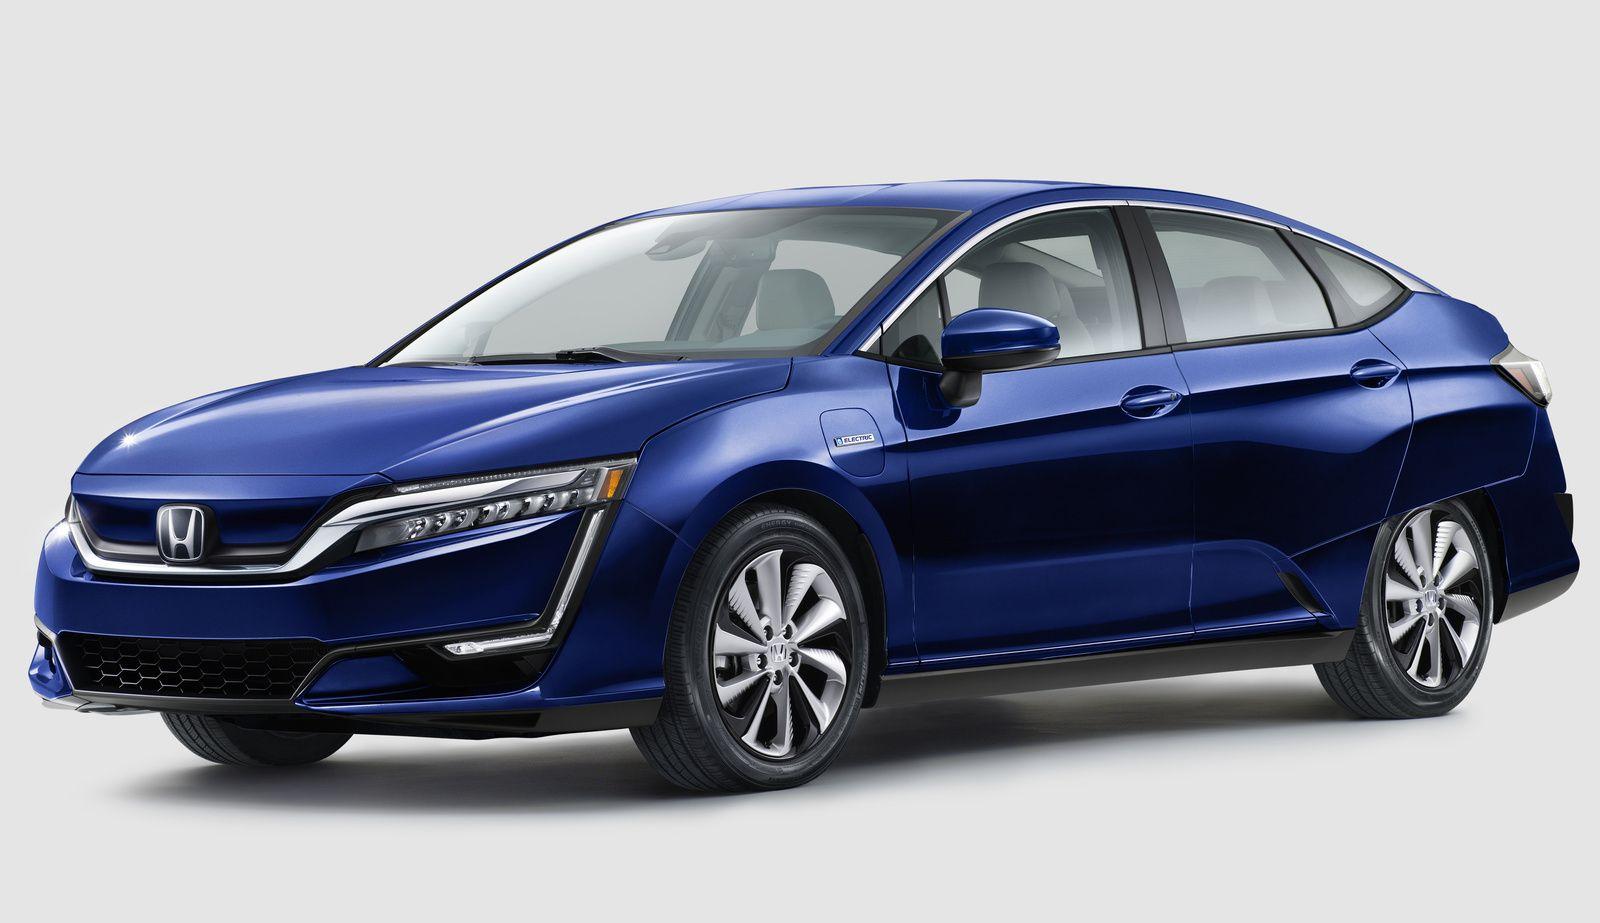 2017 Honda Clarity Electric Chevy volt, Honda electric